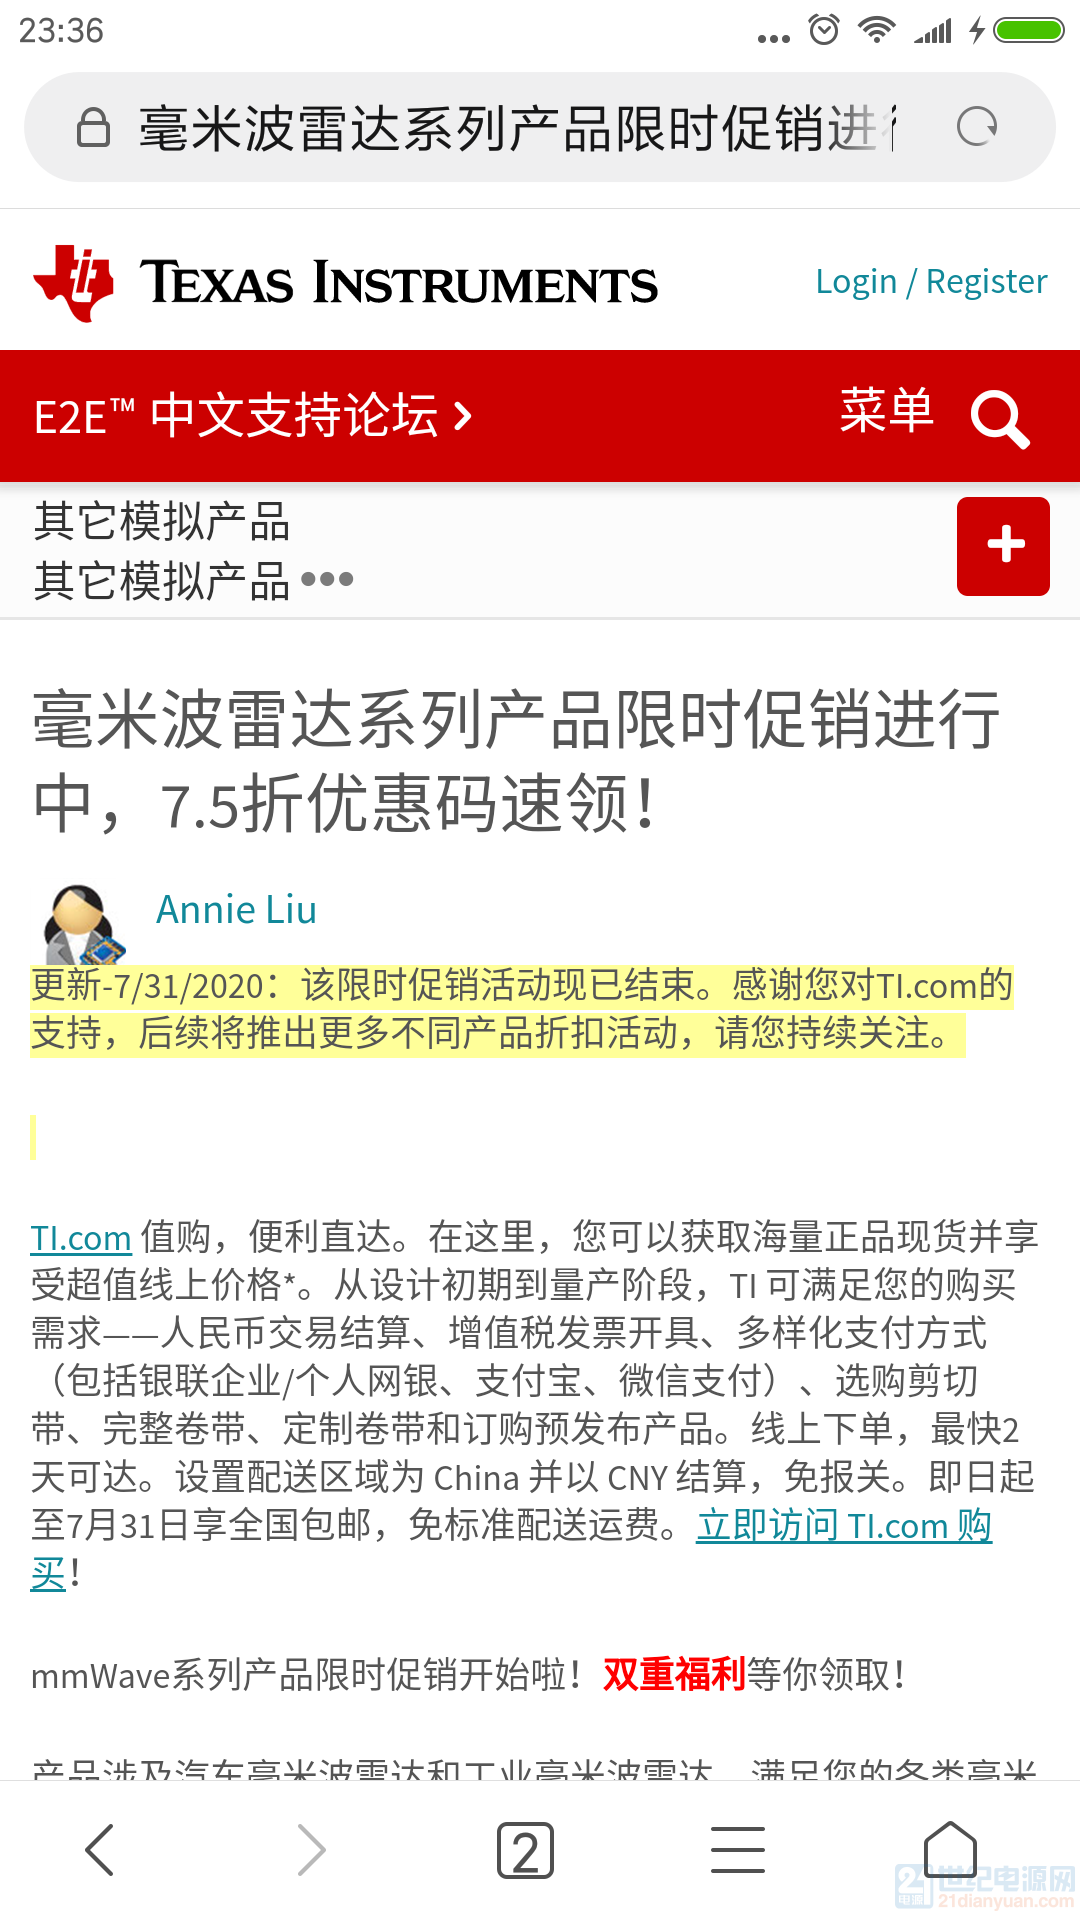 Screenshot_2020-09-23-23-36-46-687_com.android.browser.png